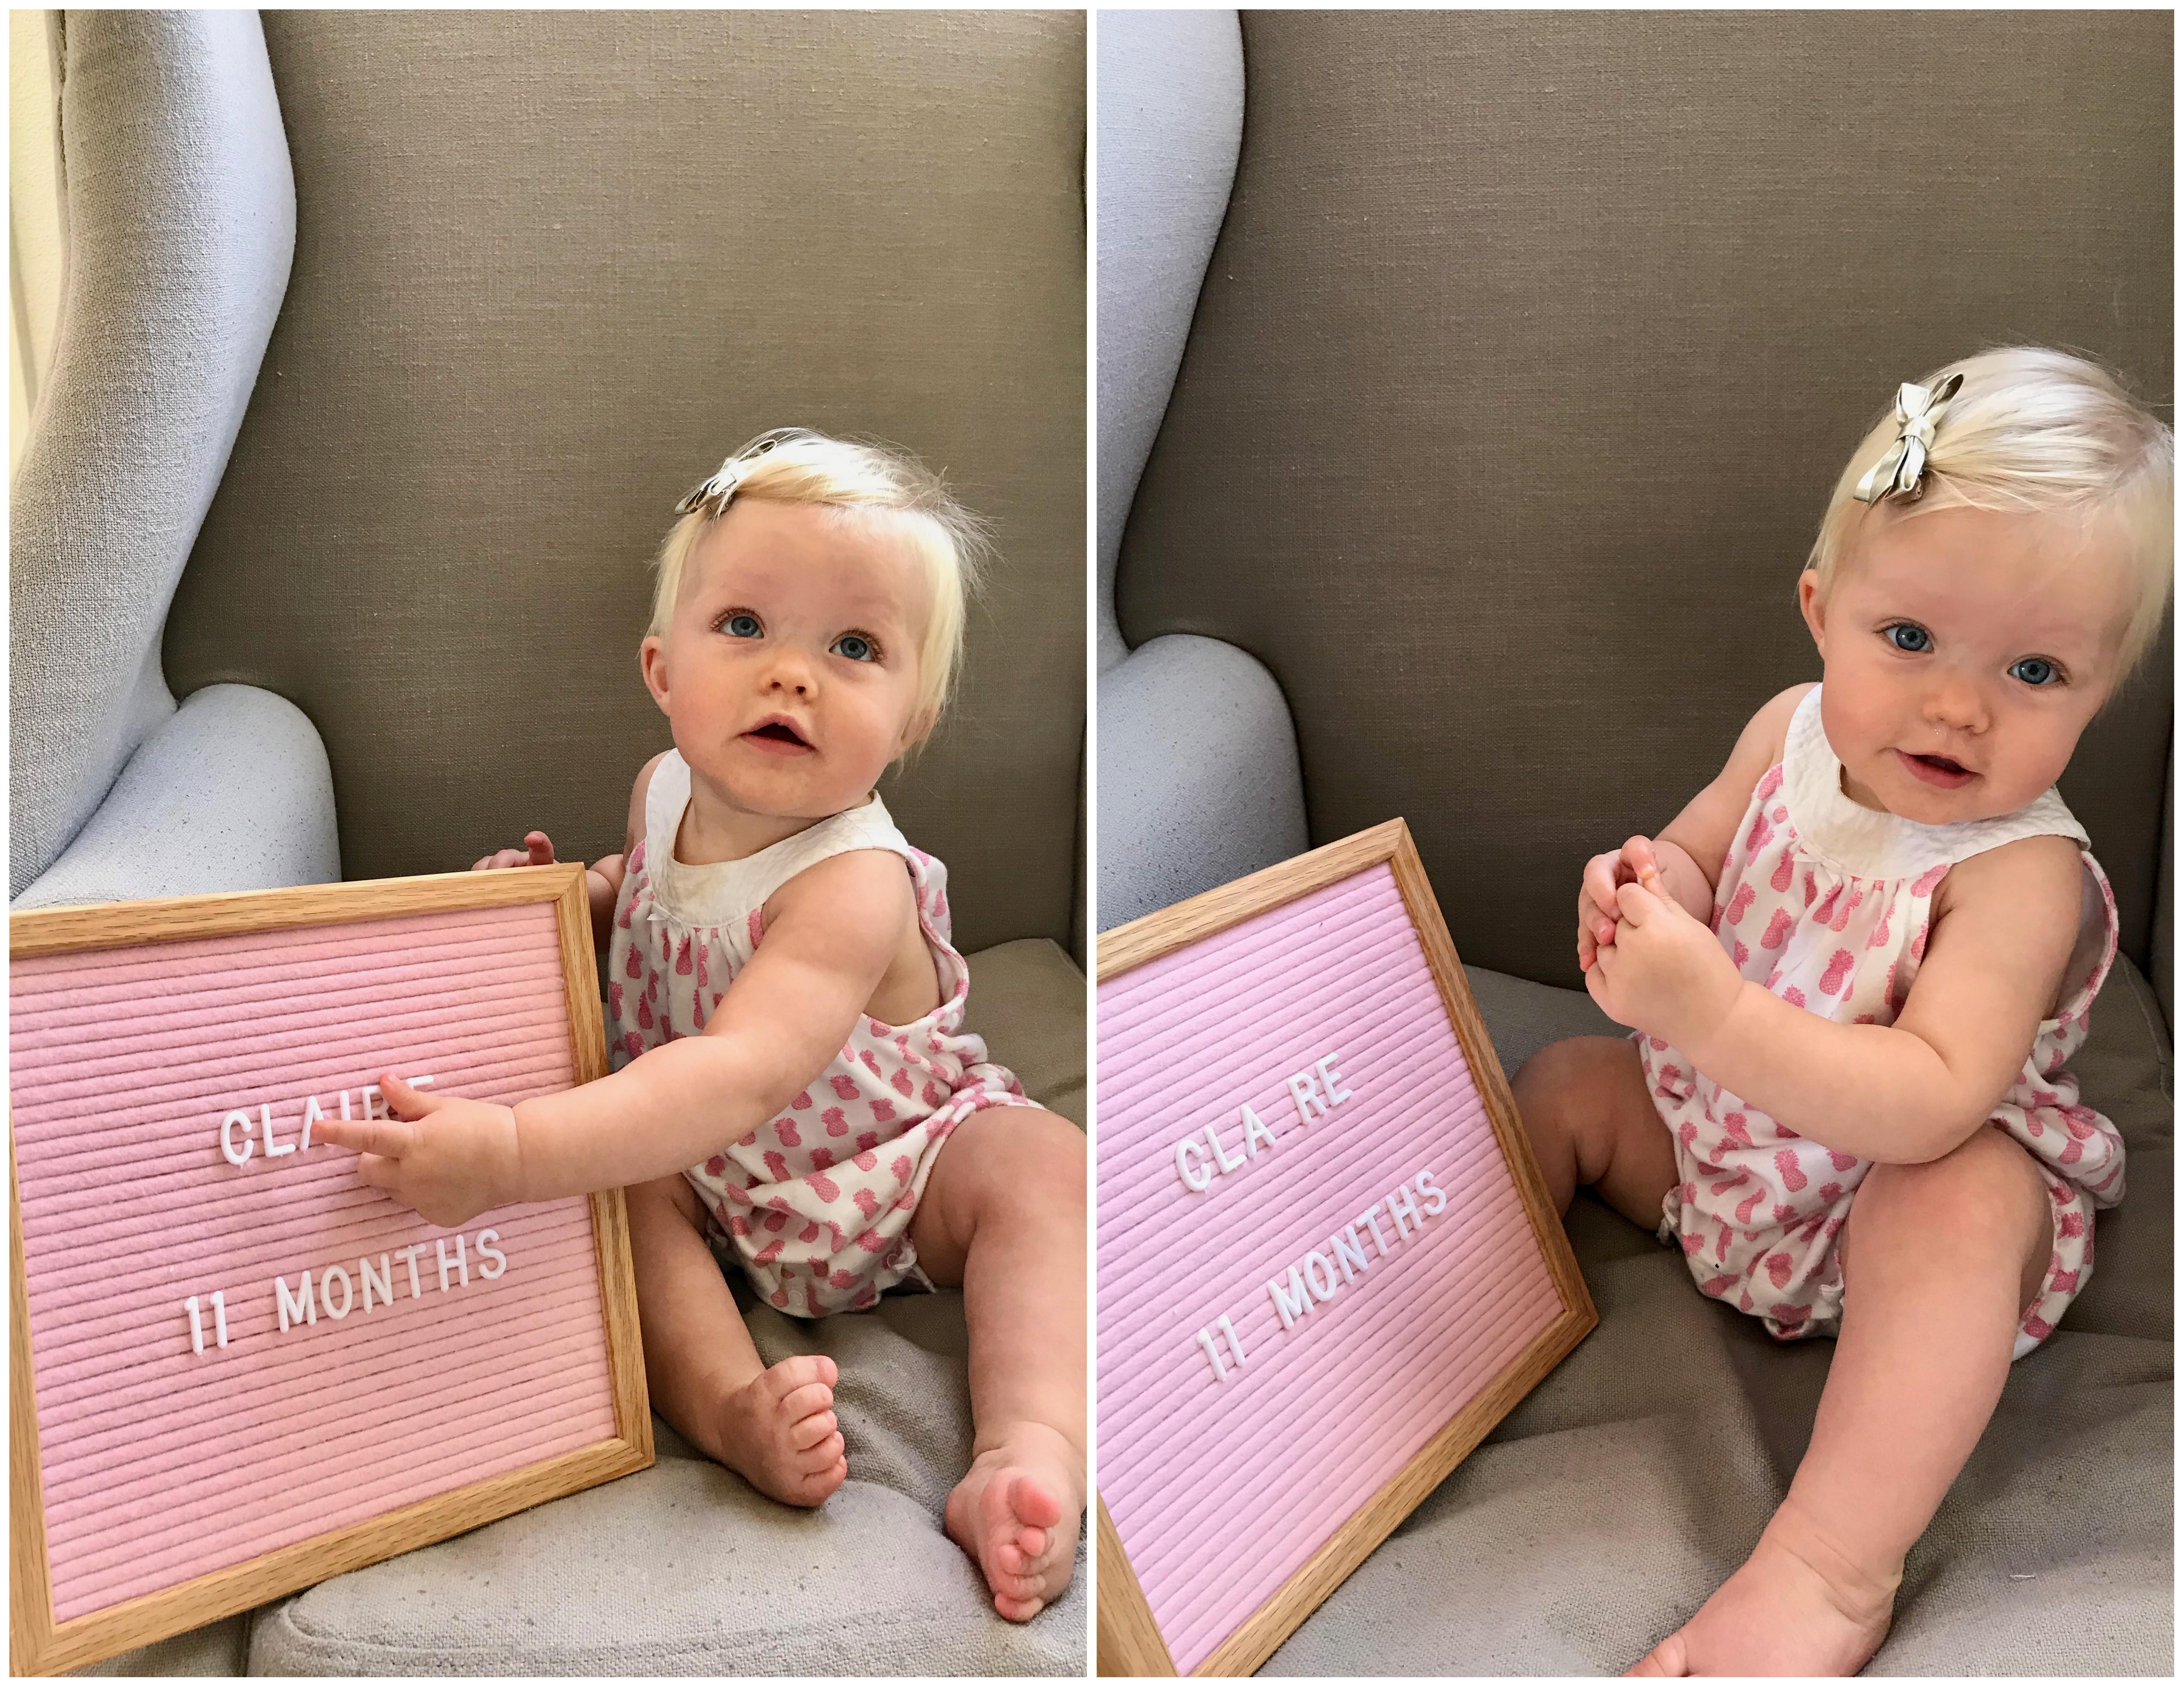 claire 11 months